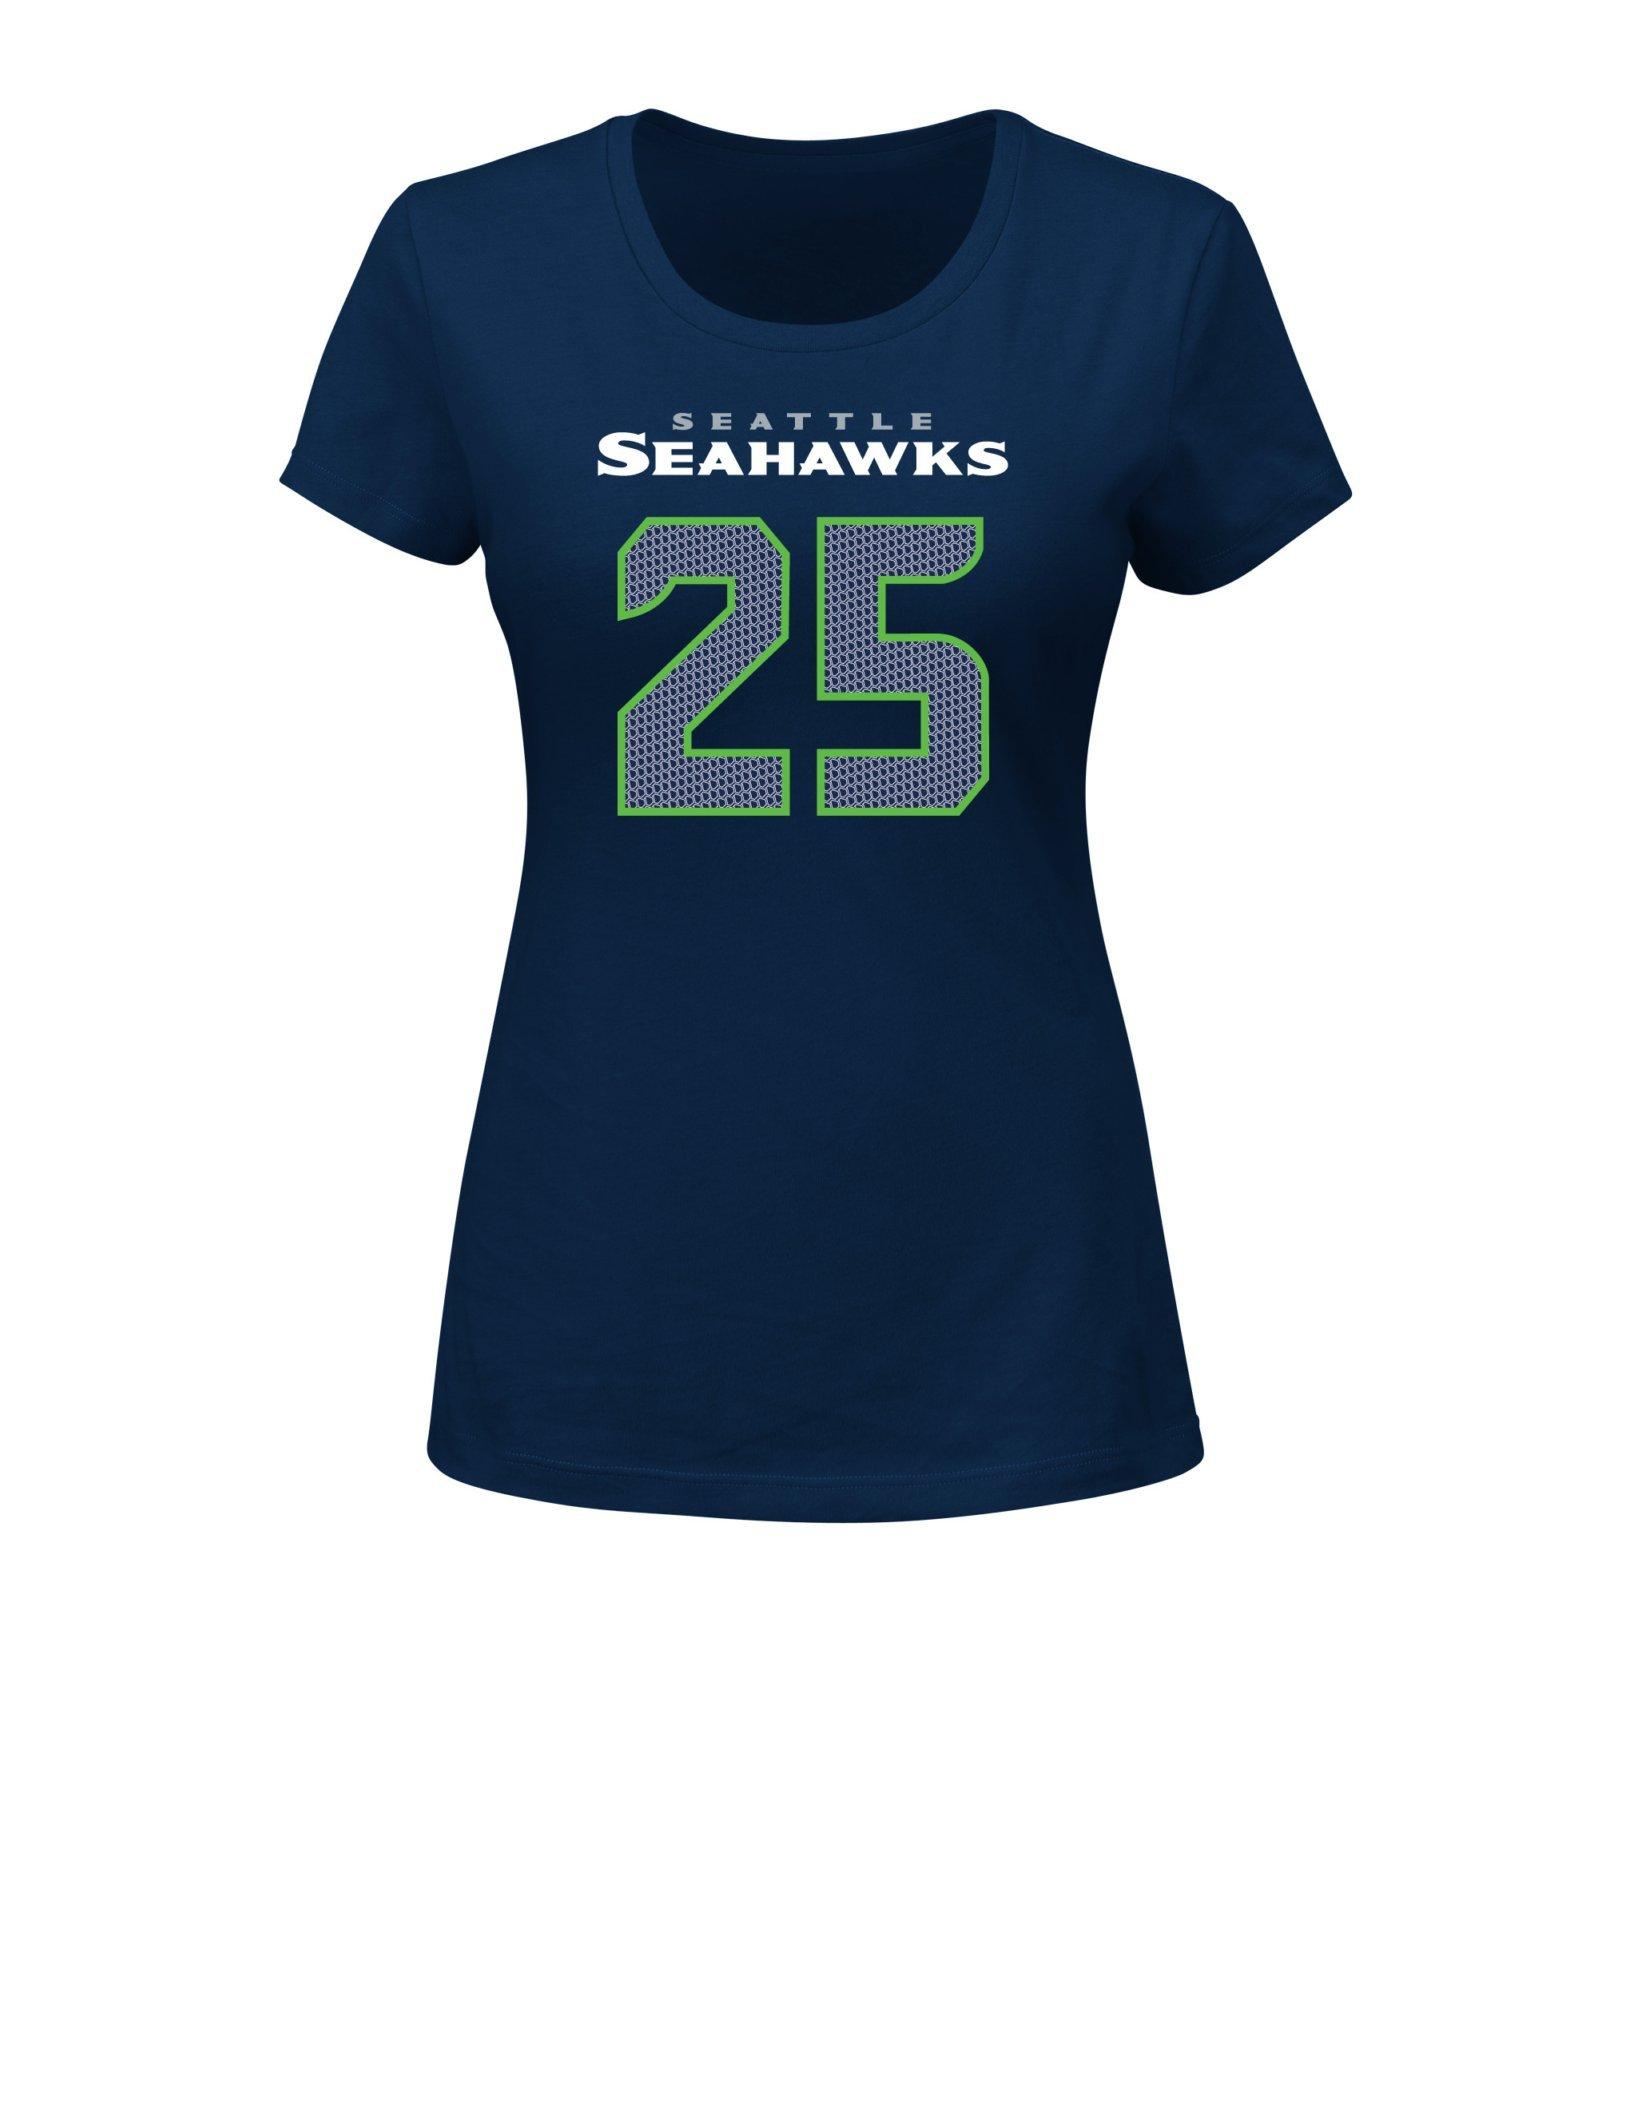 Nfl Seattle Seahawks Richard Sherman 25 Her Highlight Player Program Short Sleeve Deep Cre